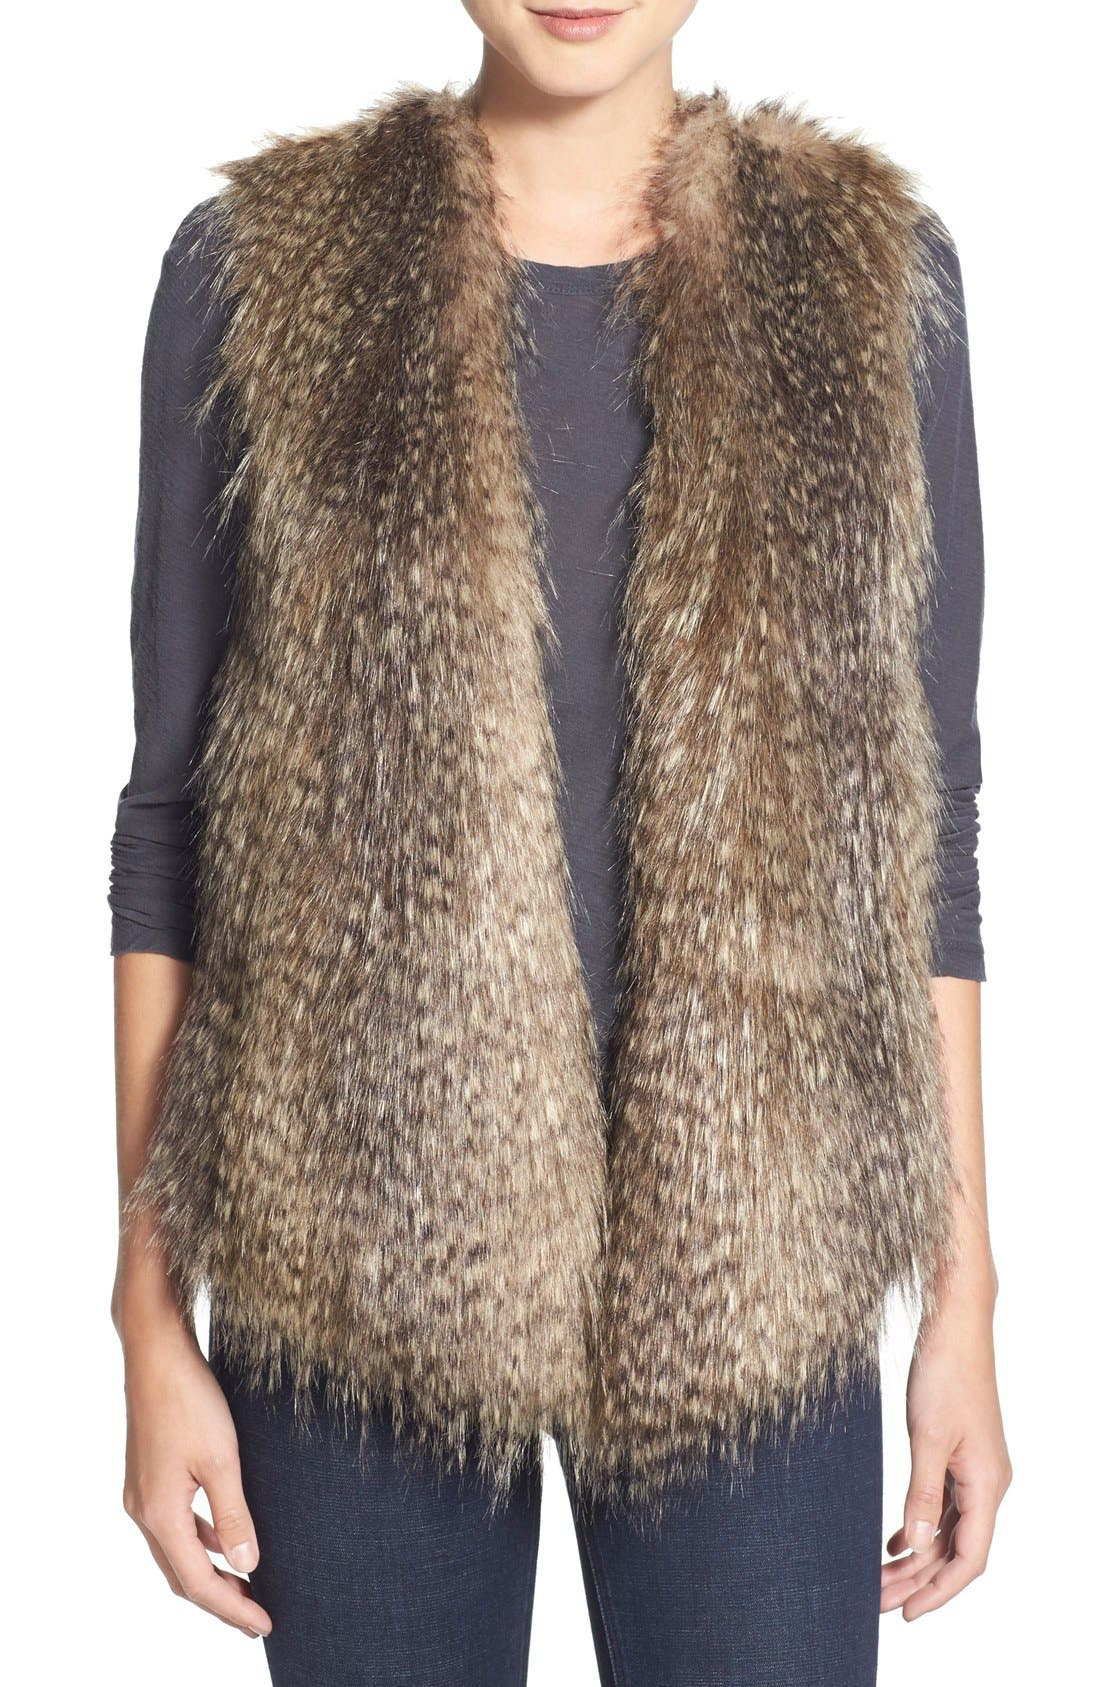 Alternate Image 1 Selected - Ella Moss 'Lyla' Faux Fur Knit Back Vest